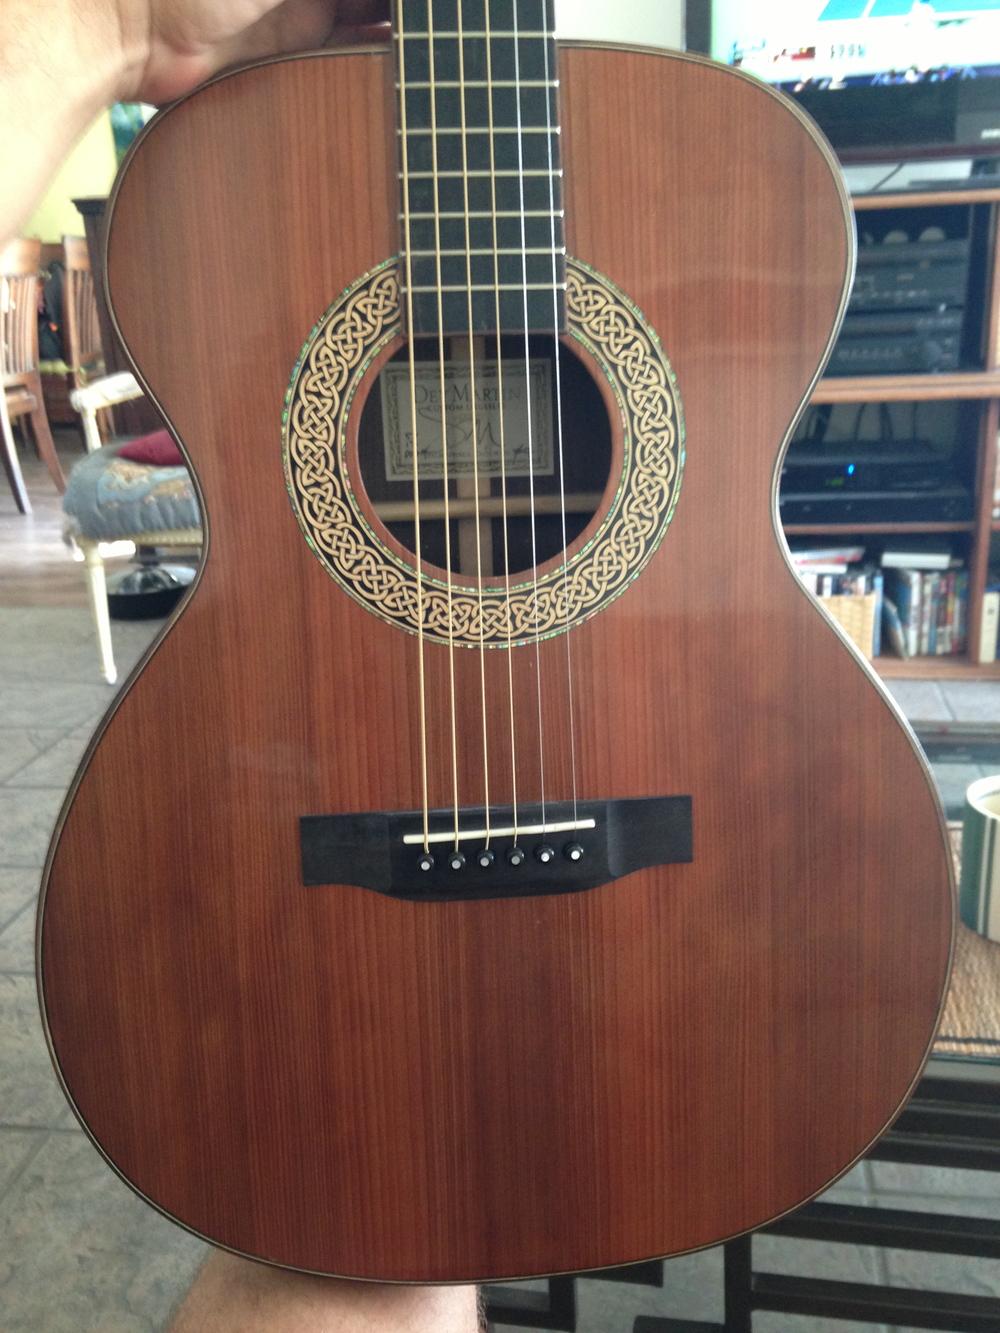 00-DM Guitar